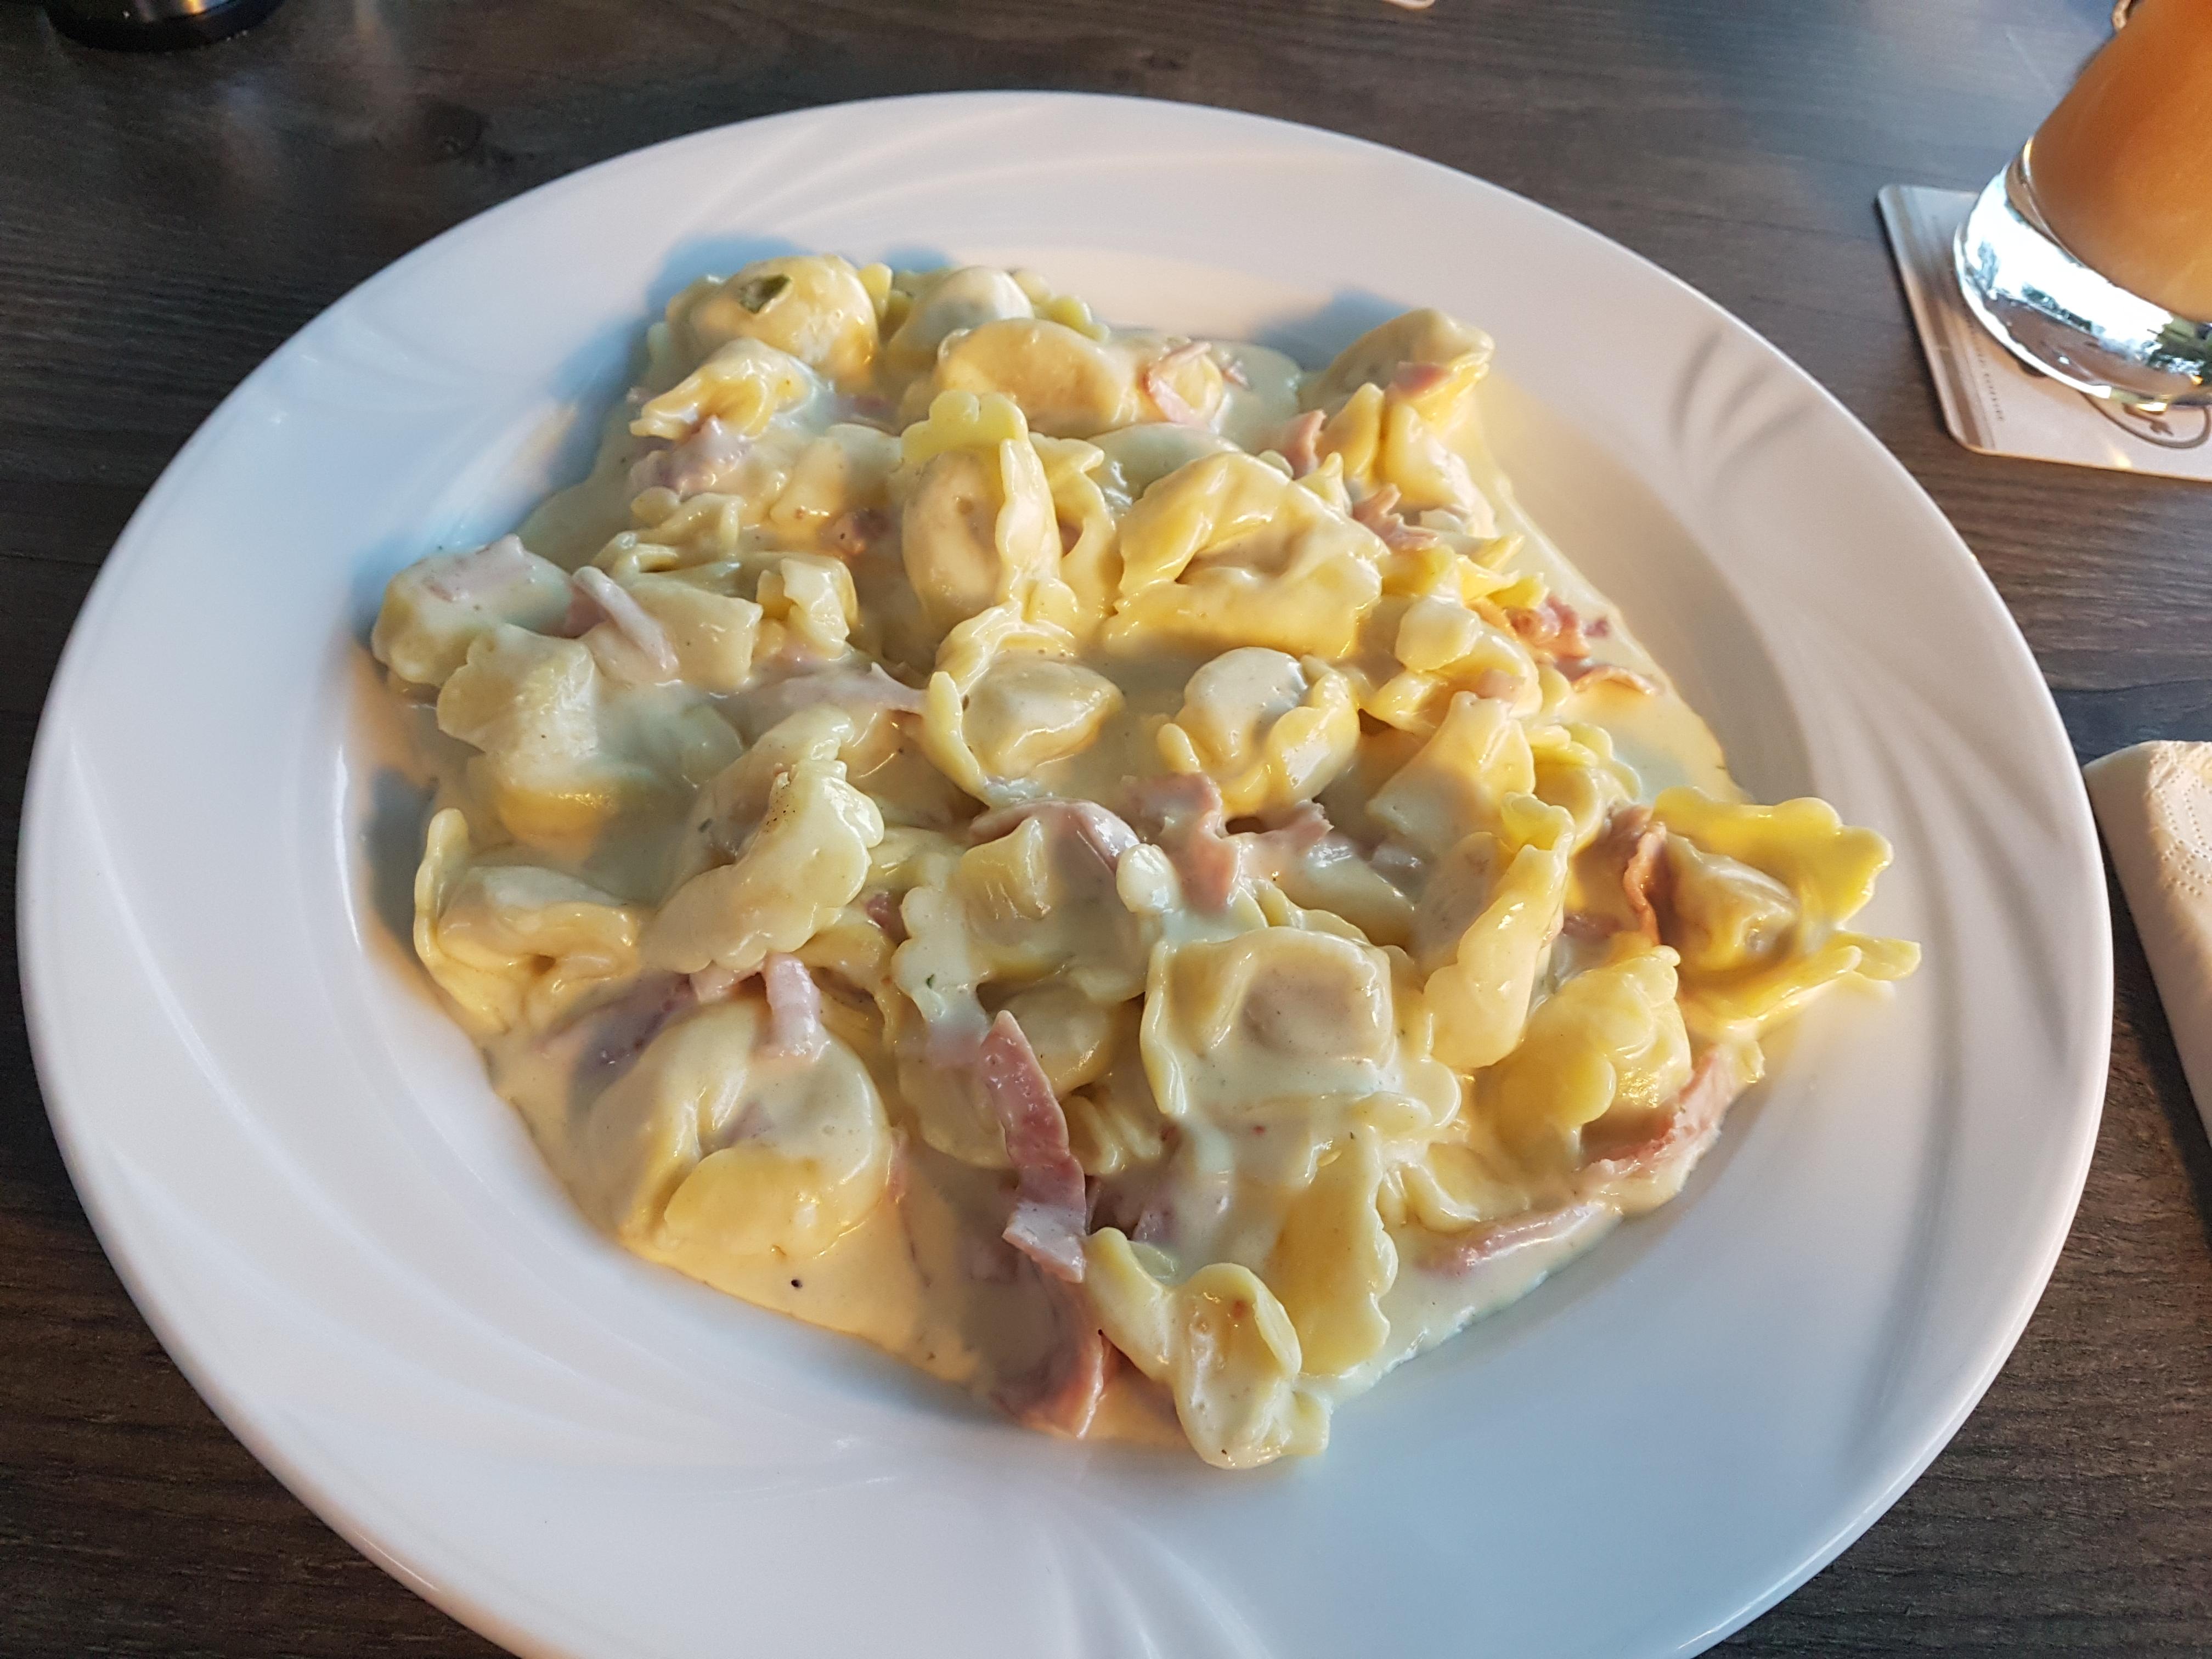 http://foodloader.net/Holz_2018-07-07_Tortellini_a_la_Panna.jpg